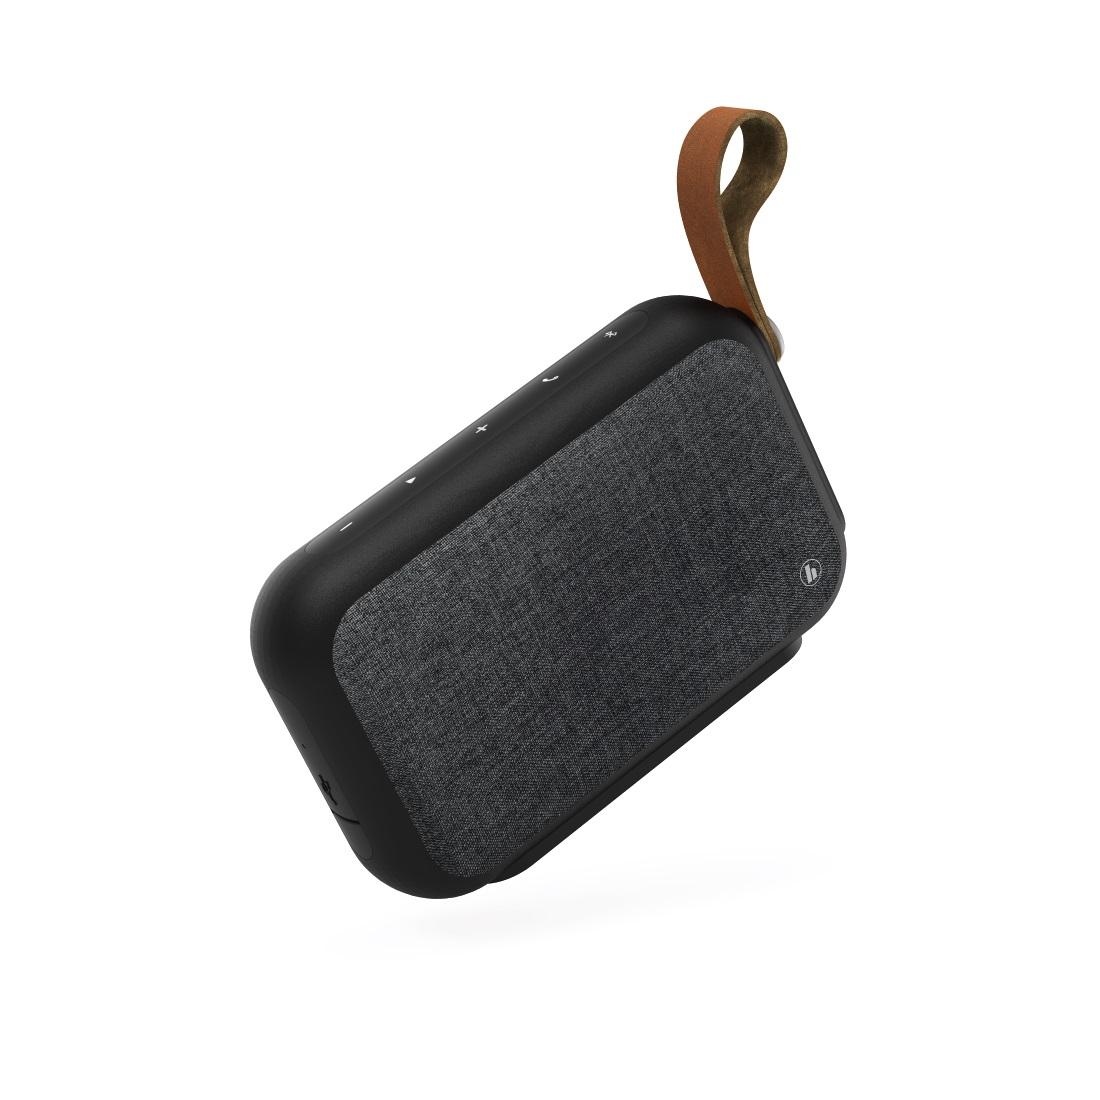 HAMA Gentleman-M Mobile Bluetooth Speaker